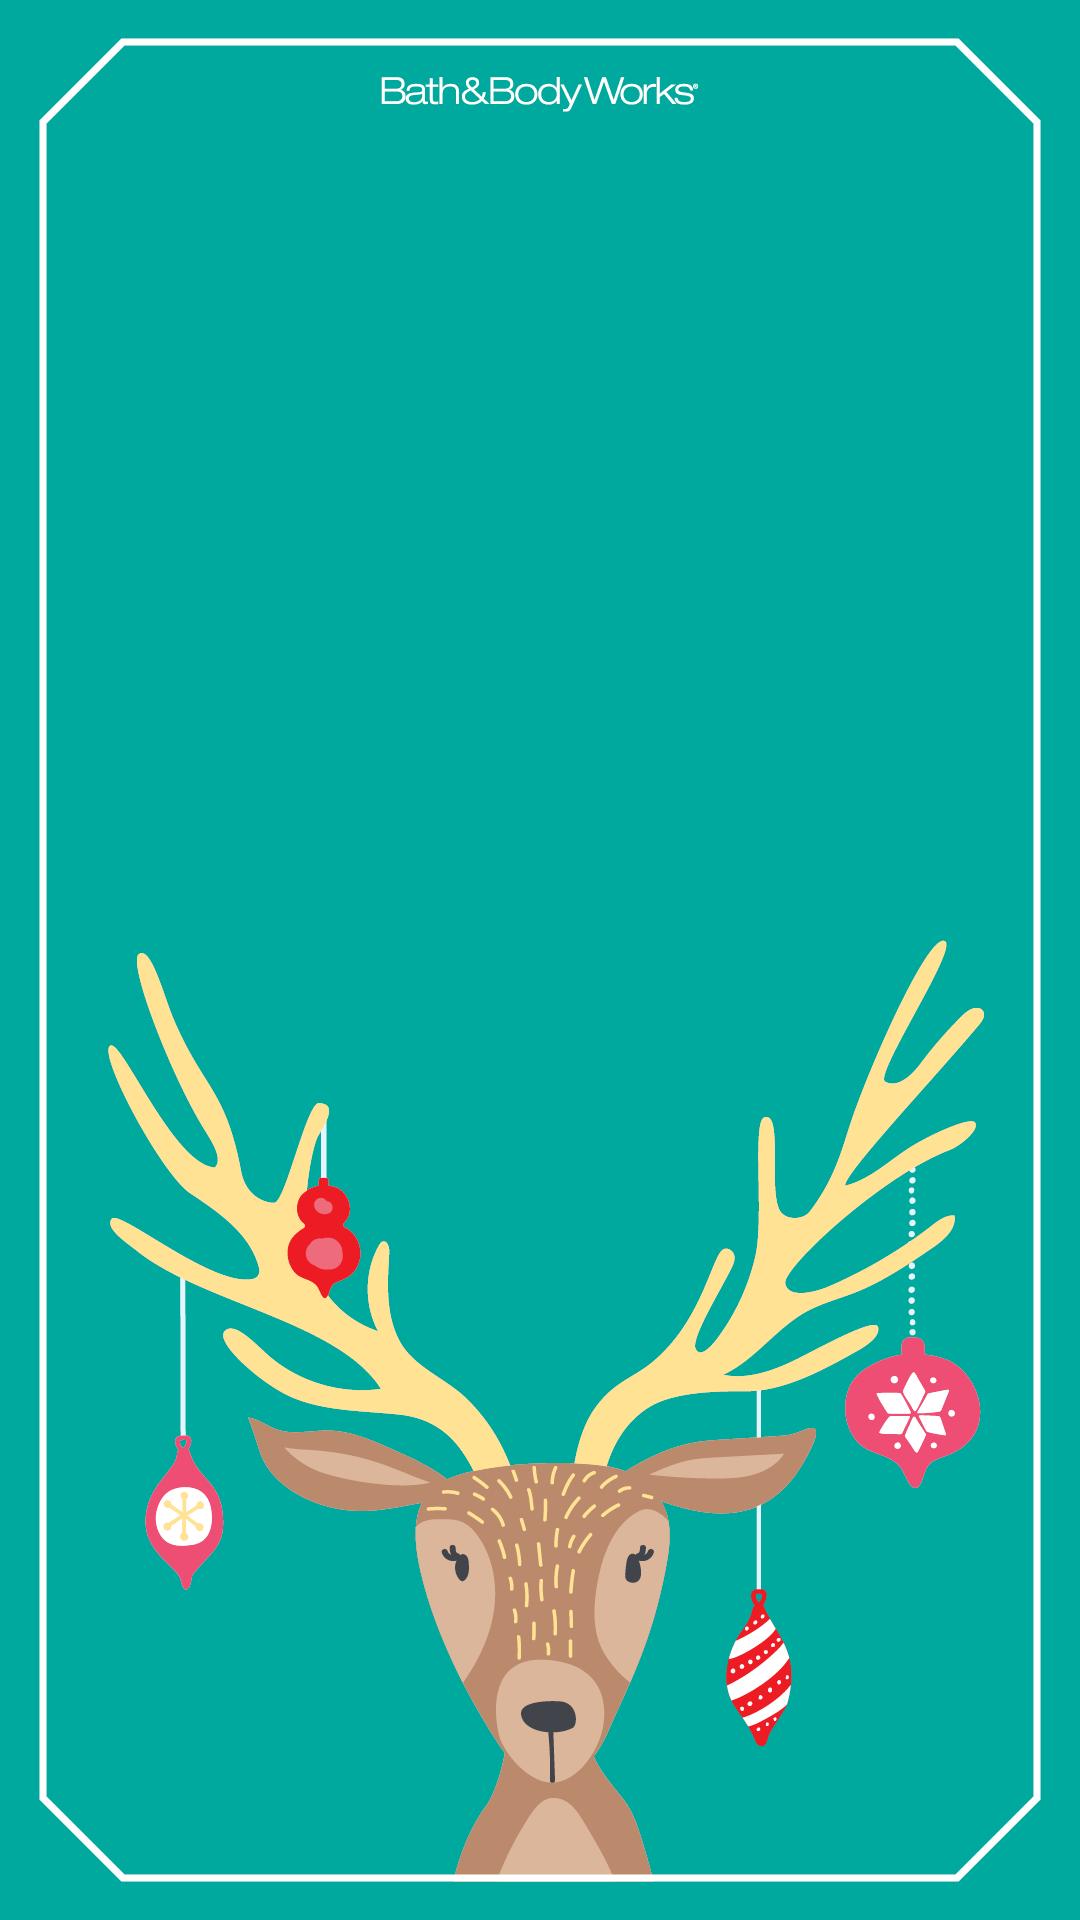 Christmas Reindeer Wallpaper Iphone Wallpaper Cat Holiday Iphone Wallpaper Wallpaper Iphone Christmas